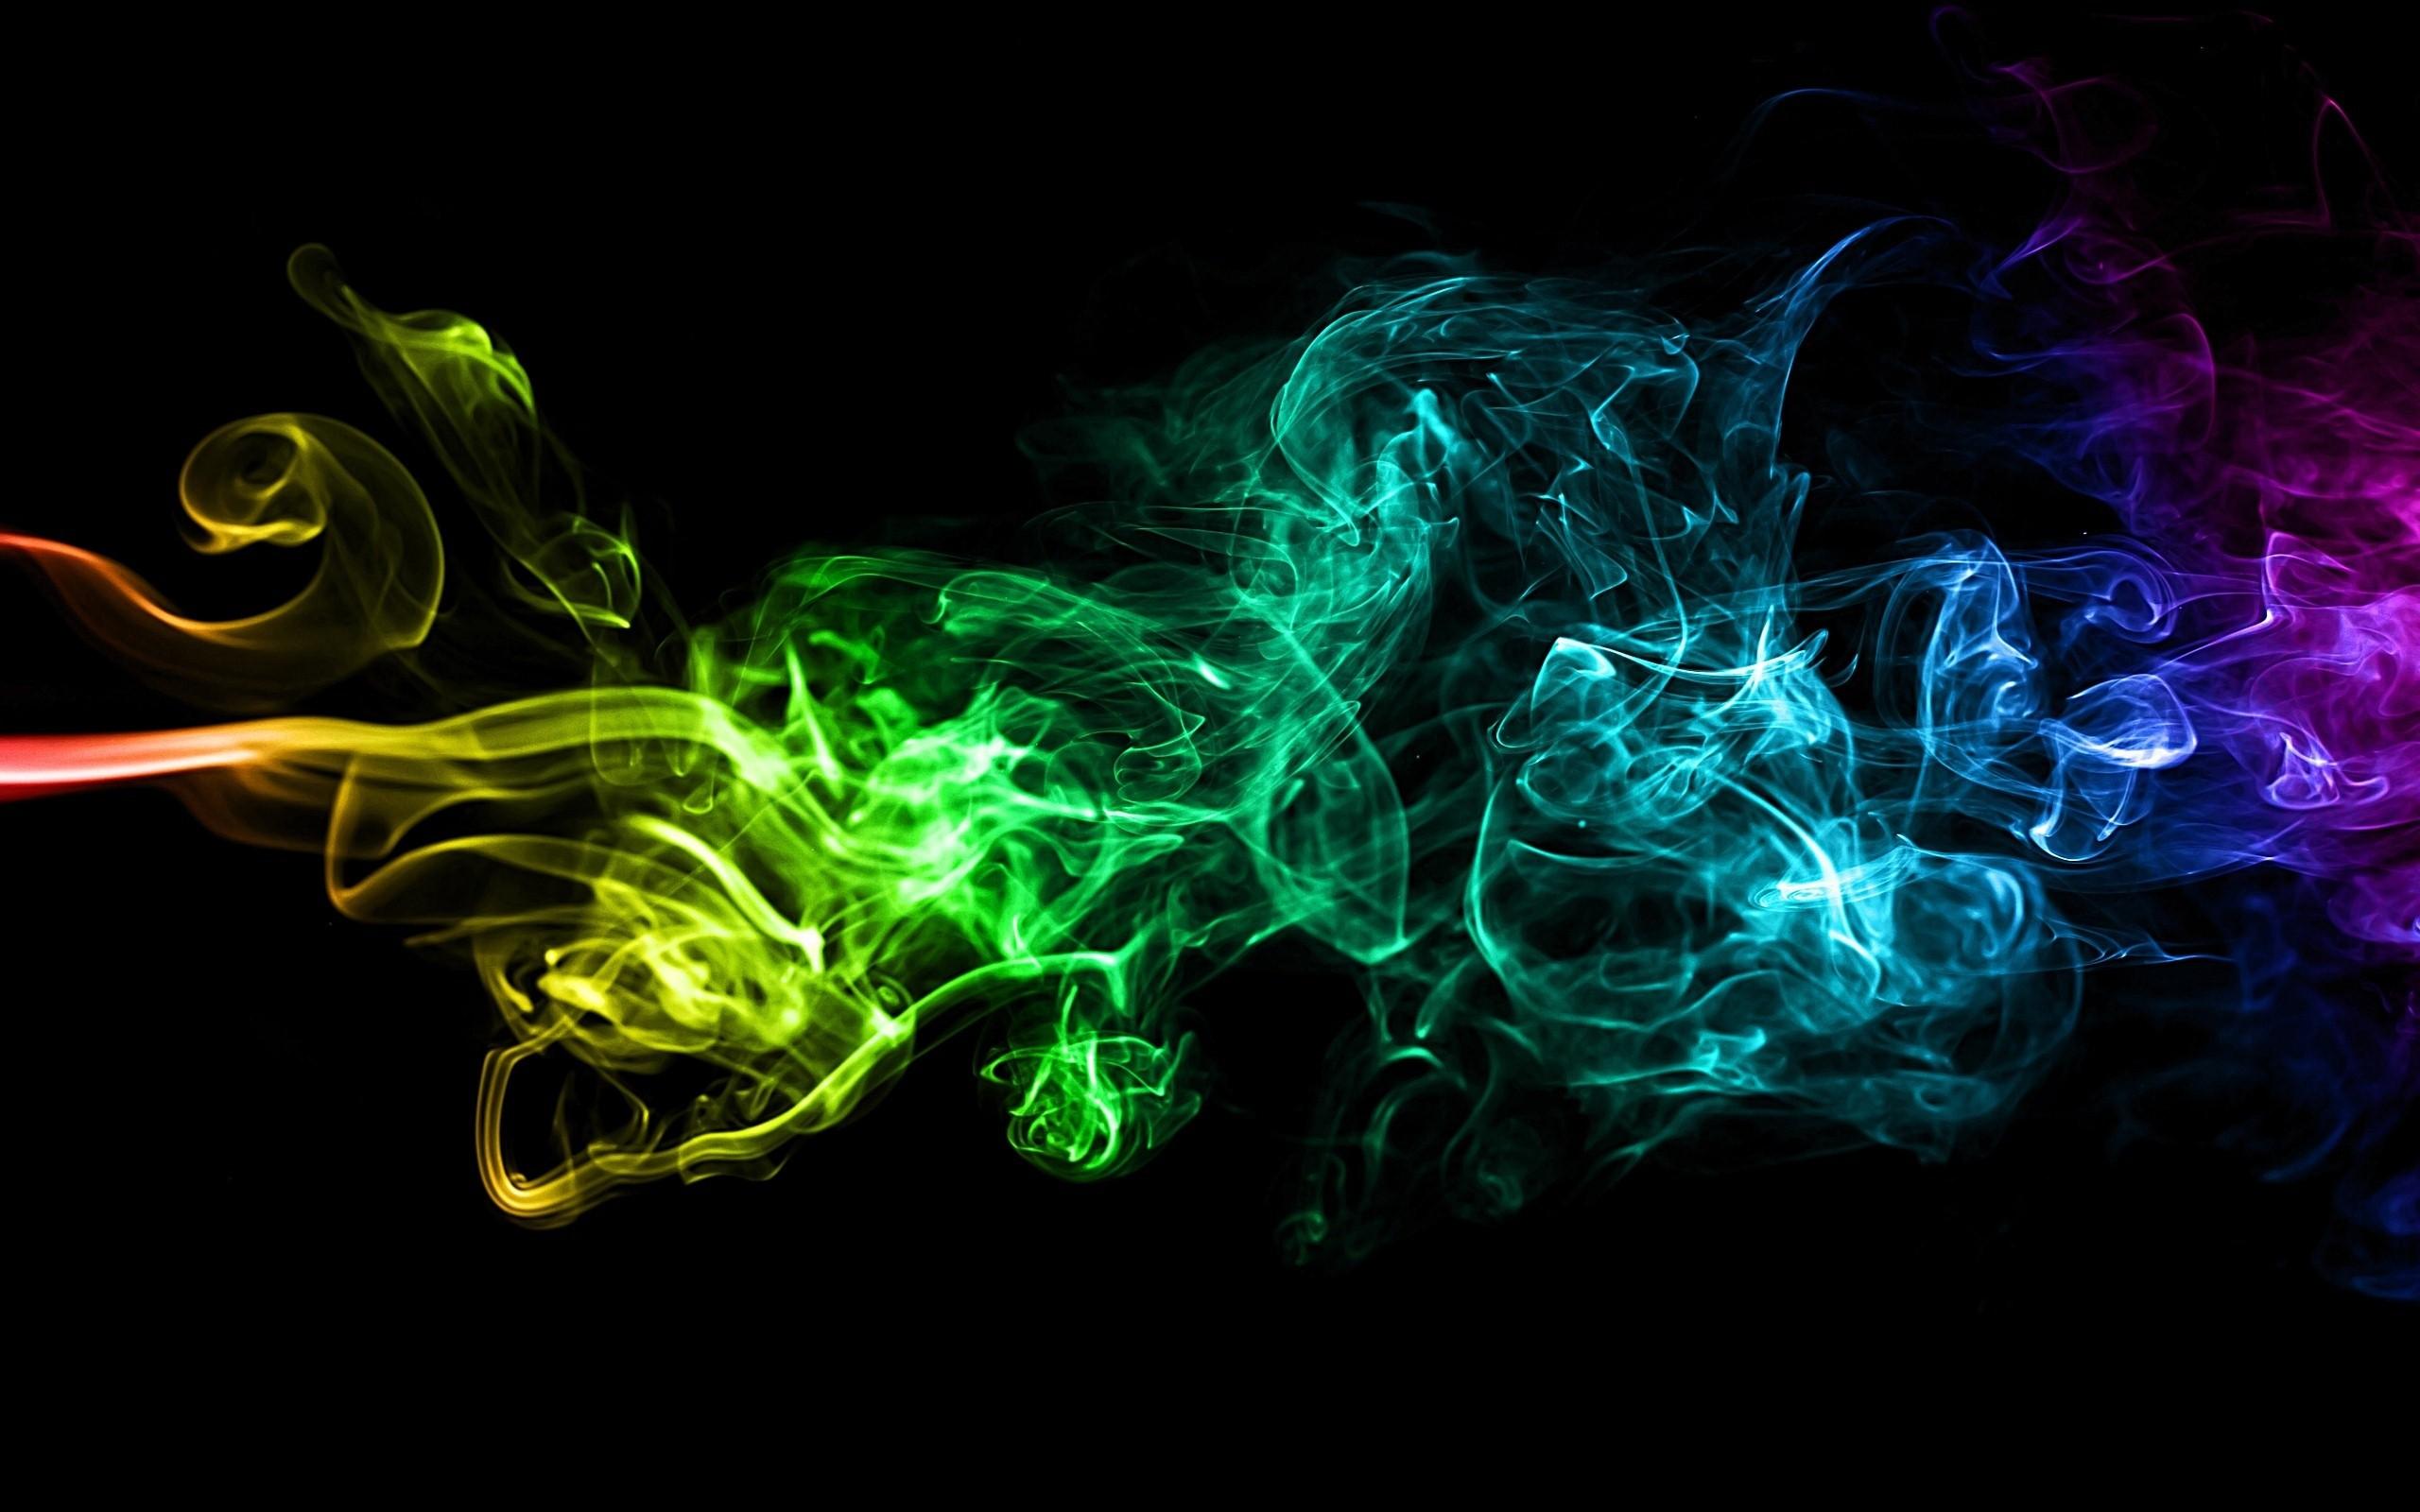 nice Abstract Colorful Smoke Art Background Image